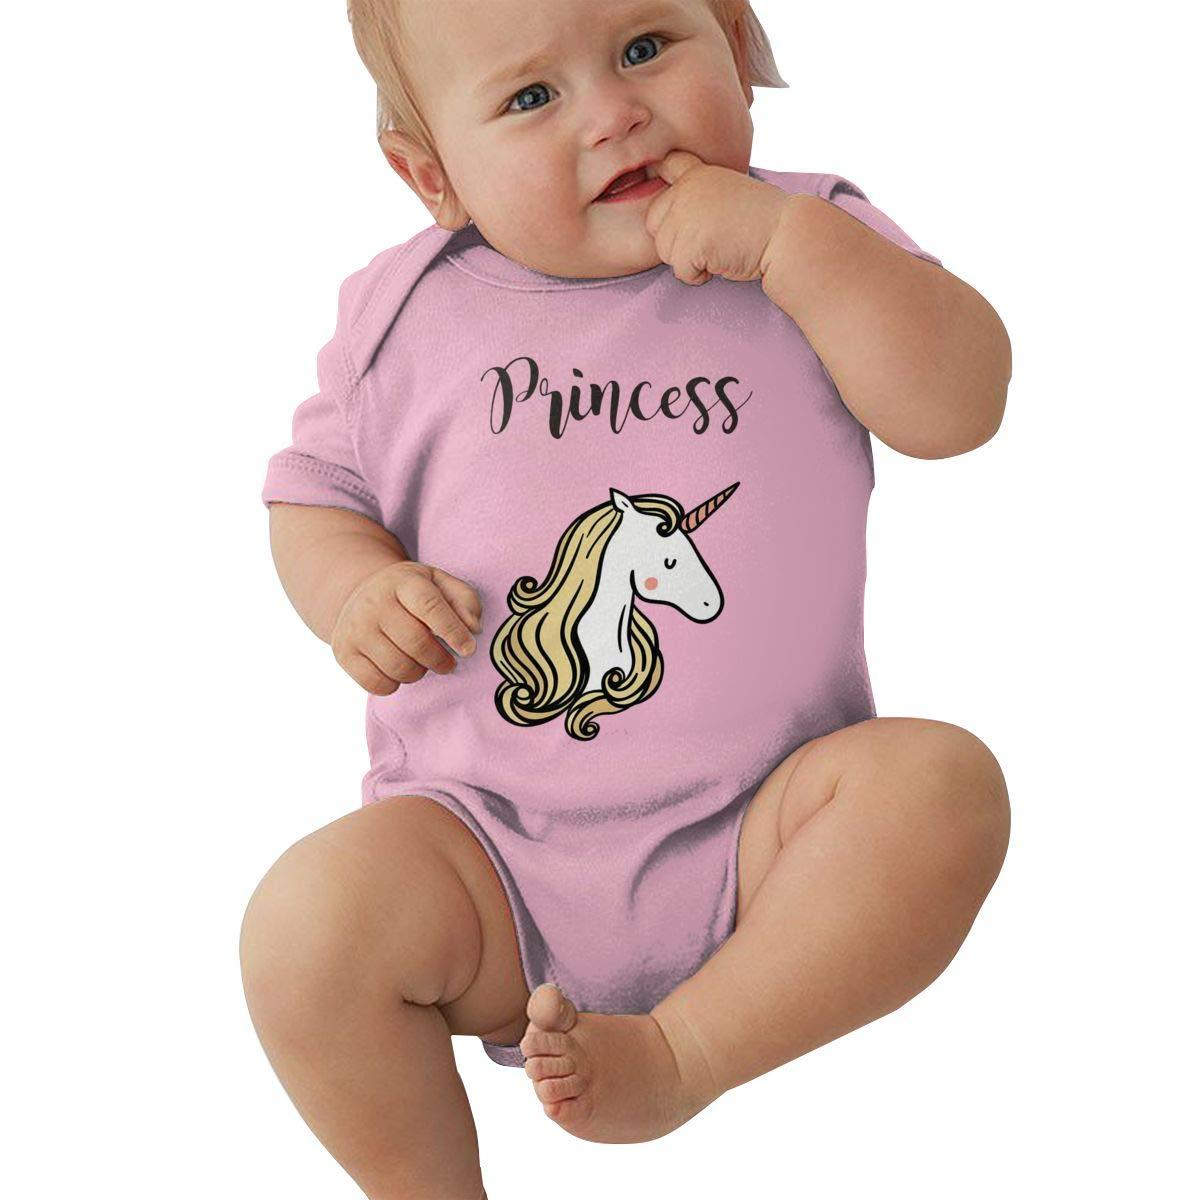 Toddler Baby Girls Bodysuit Short-Sleeve Onesie Unicorn Princess Print Outfit Spring Pajamas